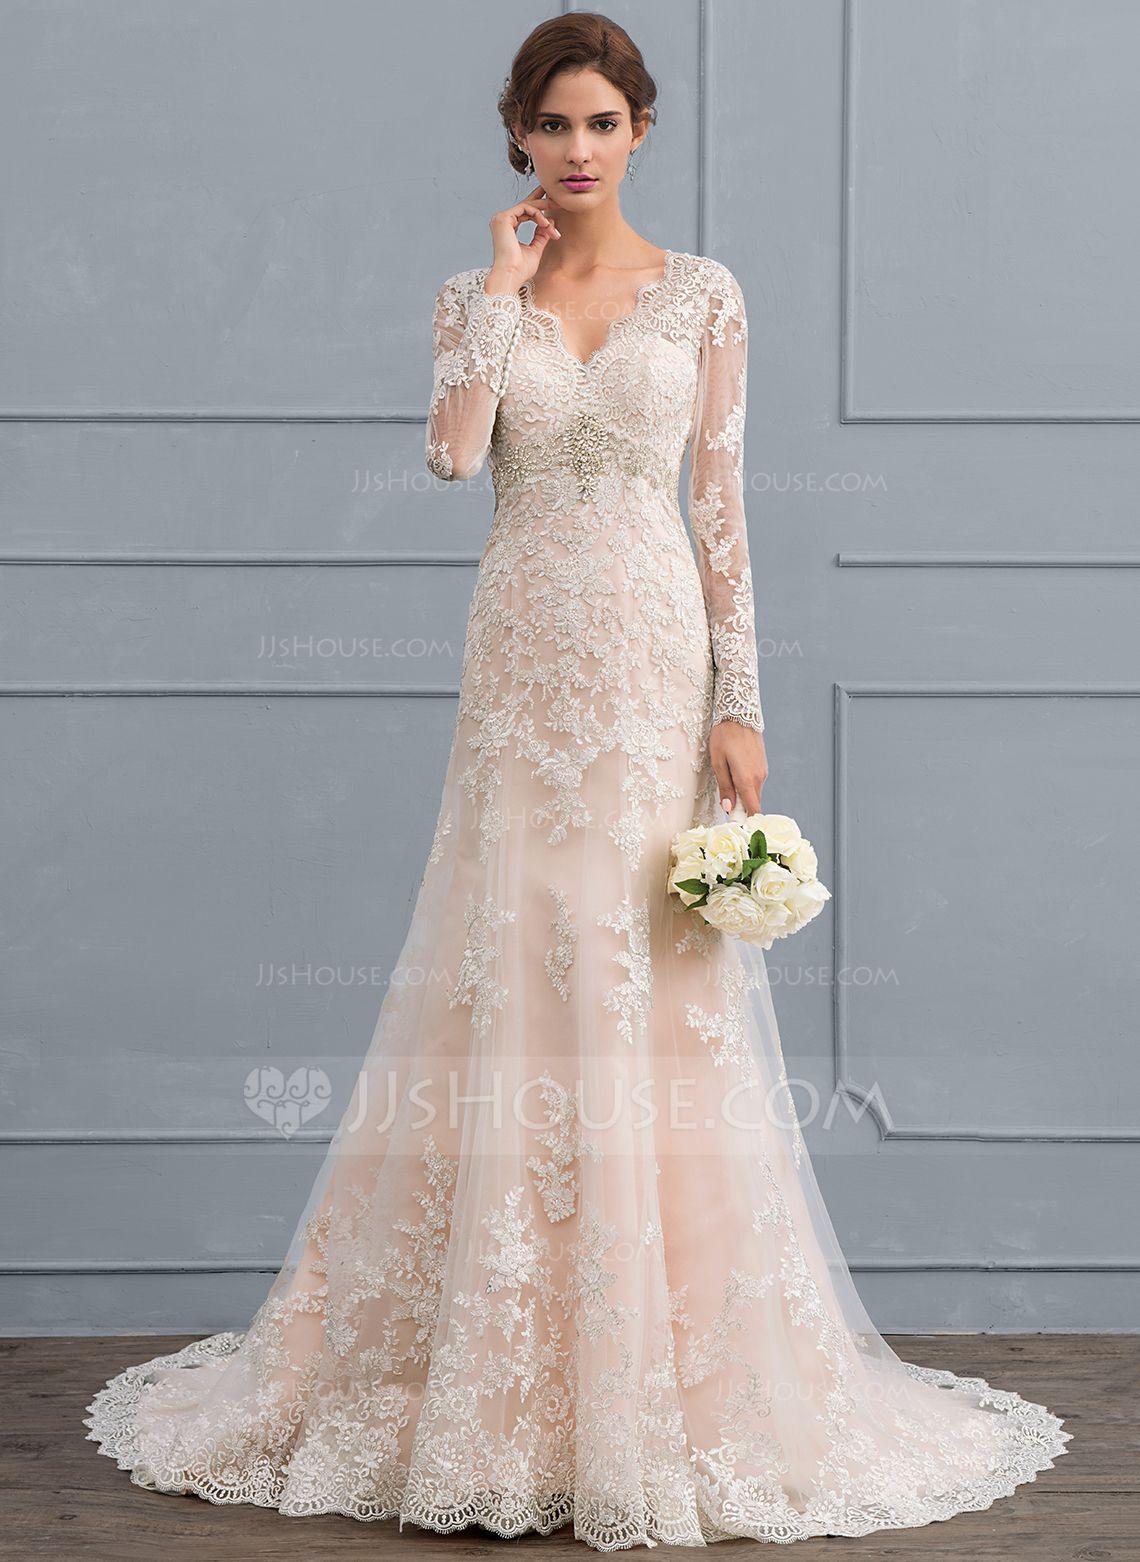 Trumpet Mermaid V Neck Court Train Tulle Lace Wedding Dress 002118440 Wedding Dresses Wedding Dress Long Sleeve Wedding Dresses Lace Wedding Dresses Simple [ 1562 x 1140 Pixel ]